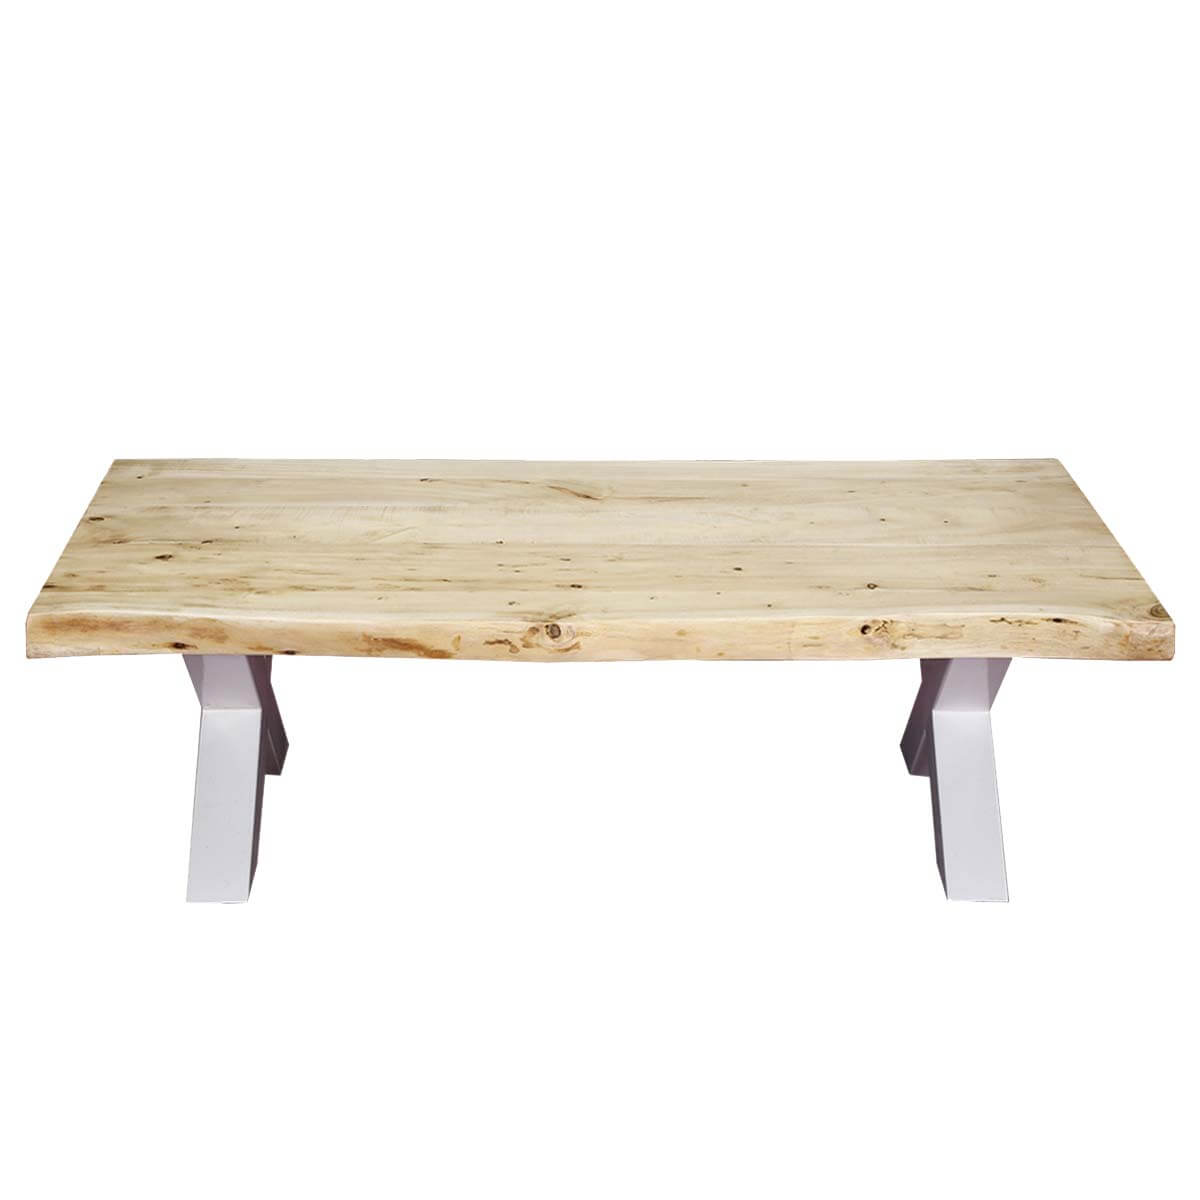 Picnic Style Acacia Wood Iron 51 Live Edge Coffee Table